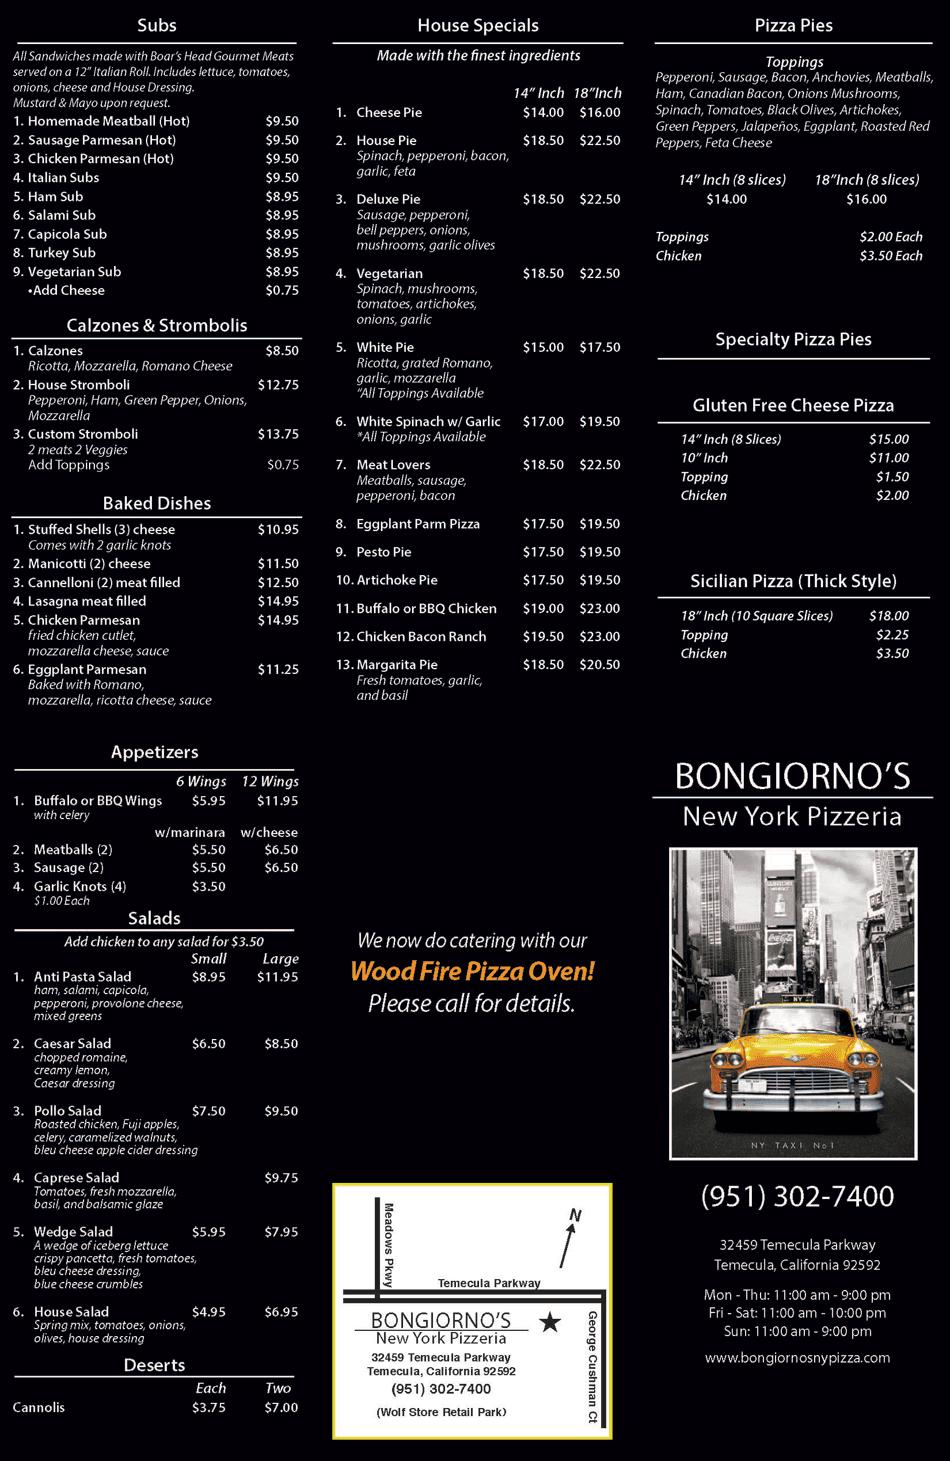 Menu | Temecula, CA | Bongiorno's New York Pizzeria | 951-302-7400